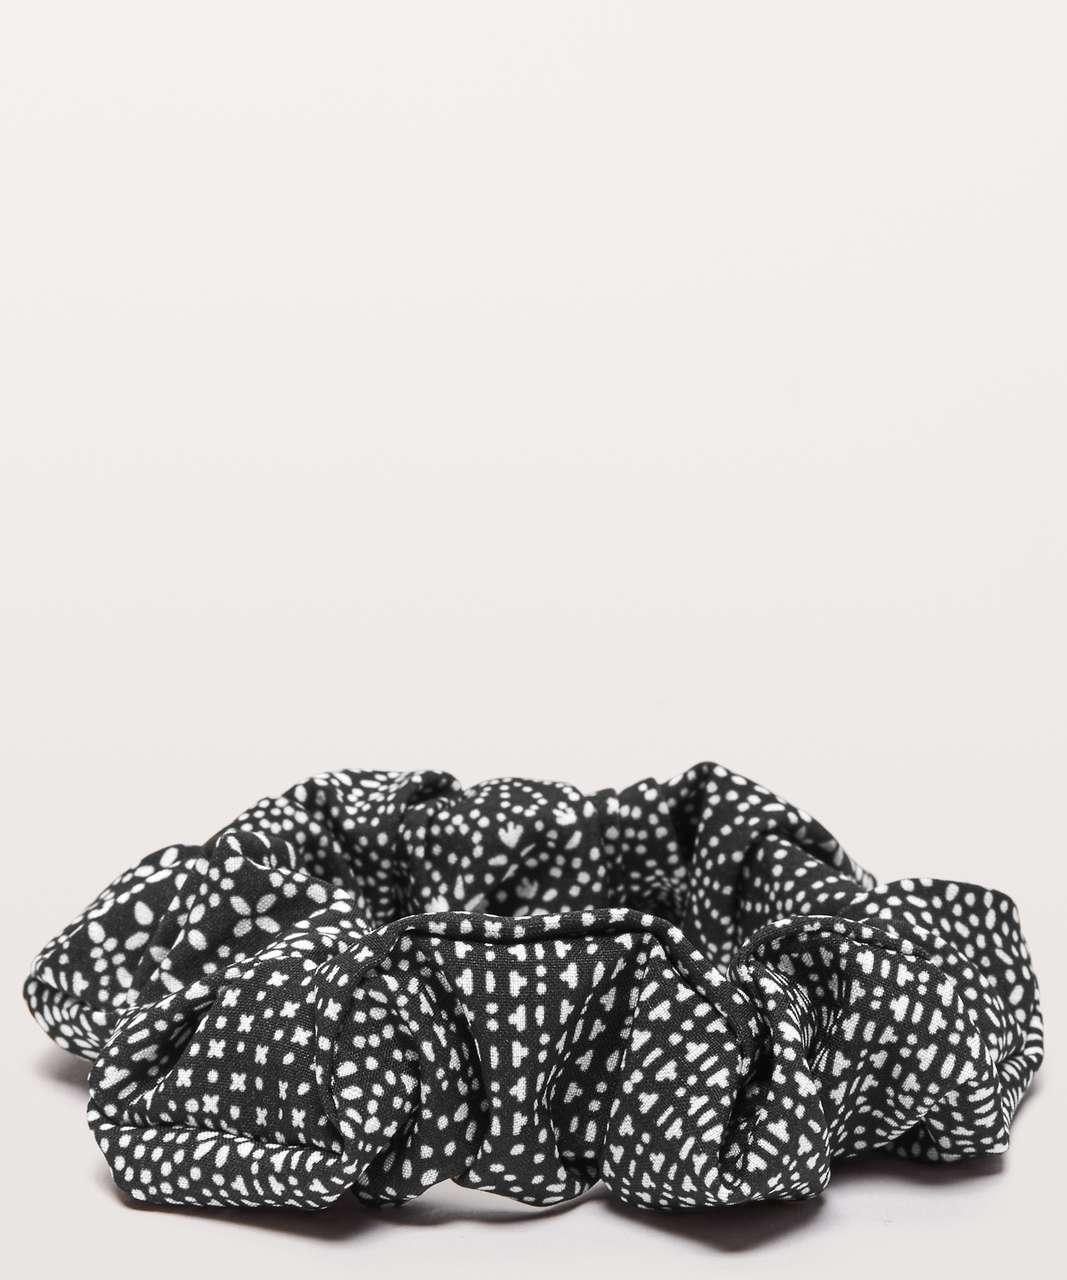 Lululemon Uplifting Scrunchie - Meisai White Black